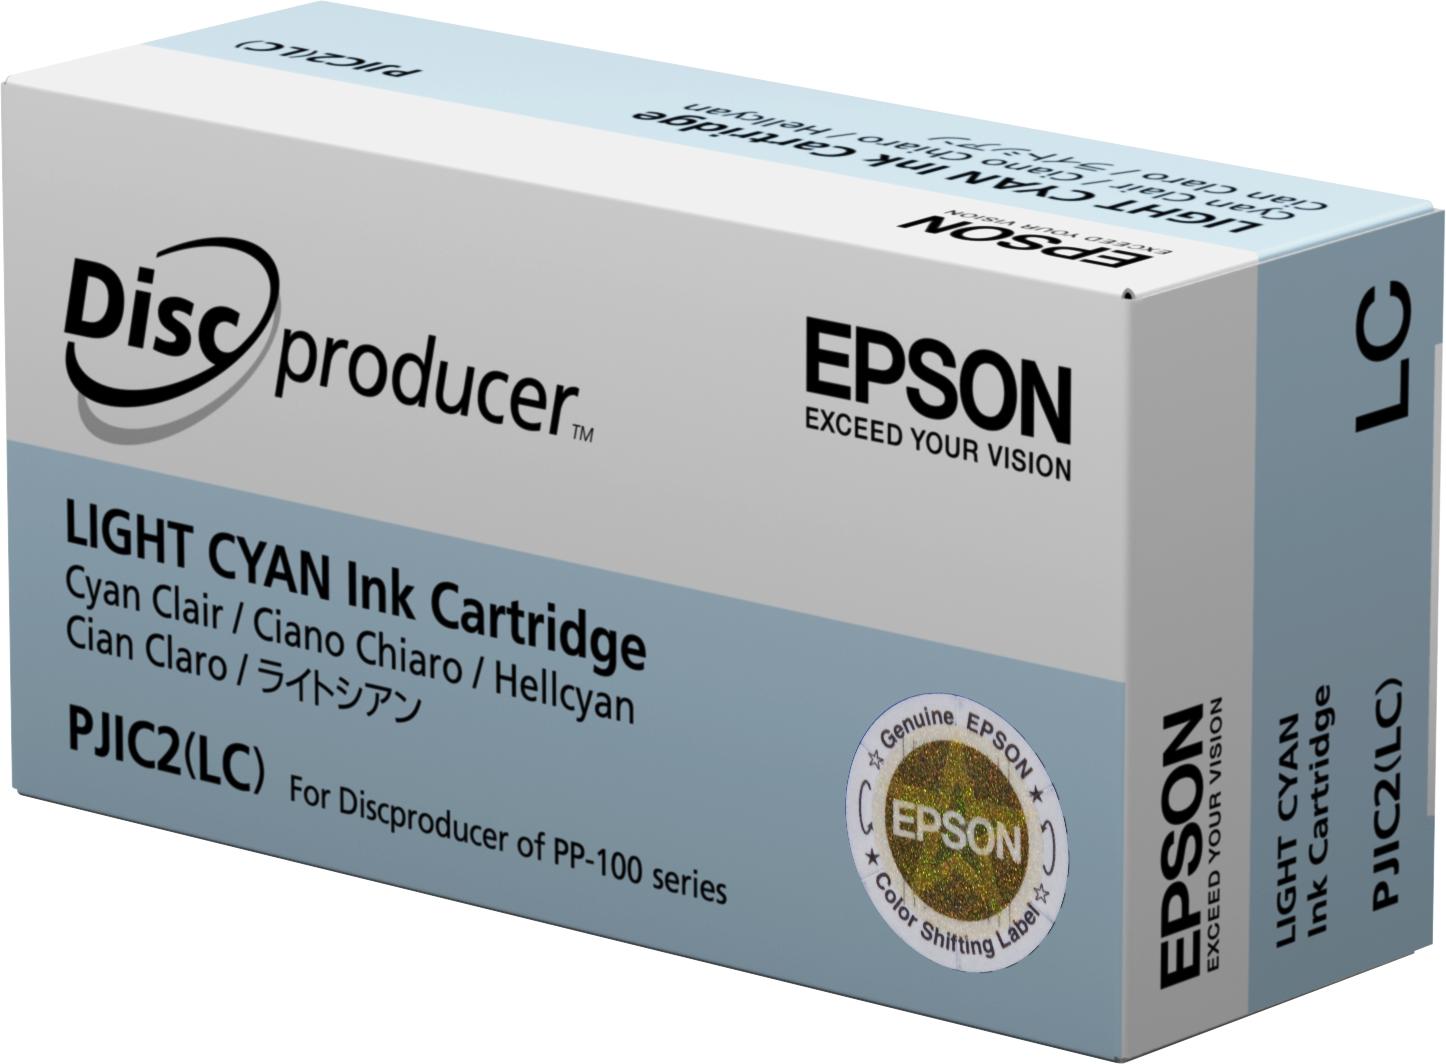 Epson Cartucho Discproducer cian claro (cantidad mínima=10)